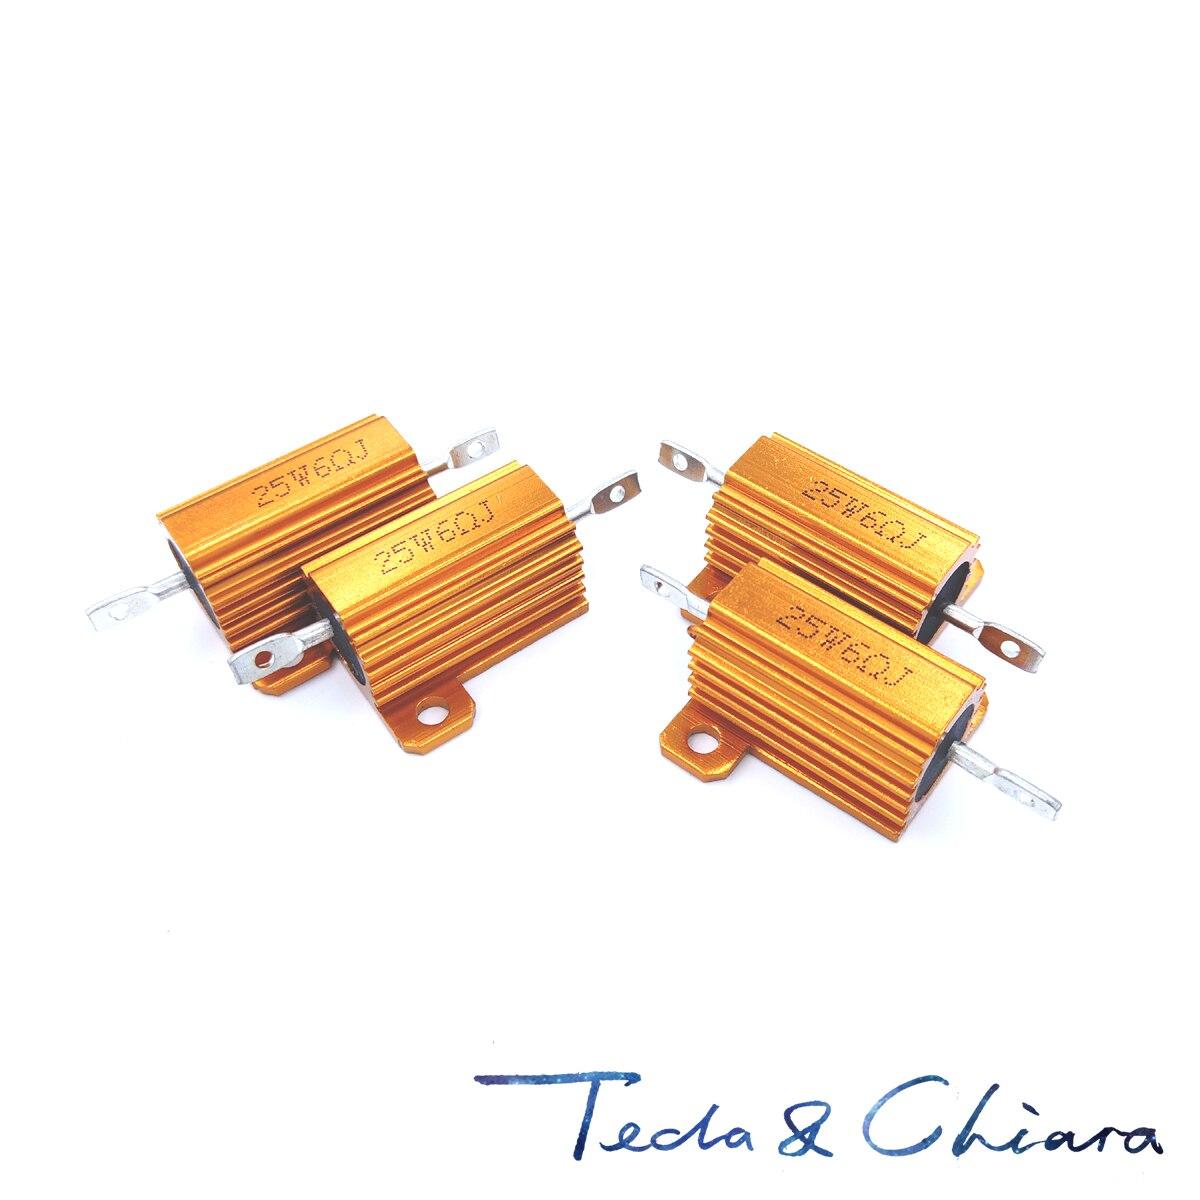 2 pces 100r 100ohm 100 10r 10ohm 10 r ohm 25 w watt wirewound alumínio potência metal escudo caso resistência resistor rx24